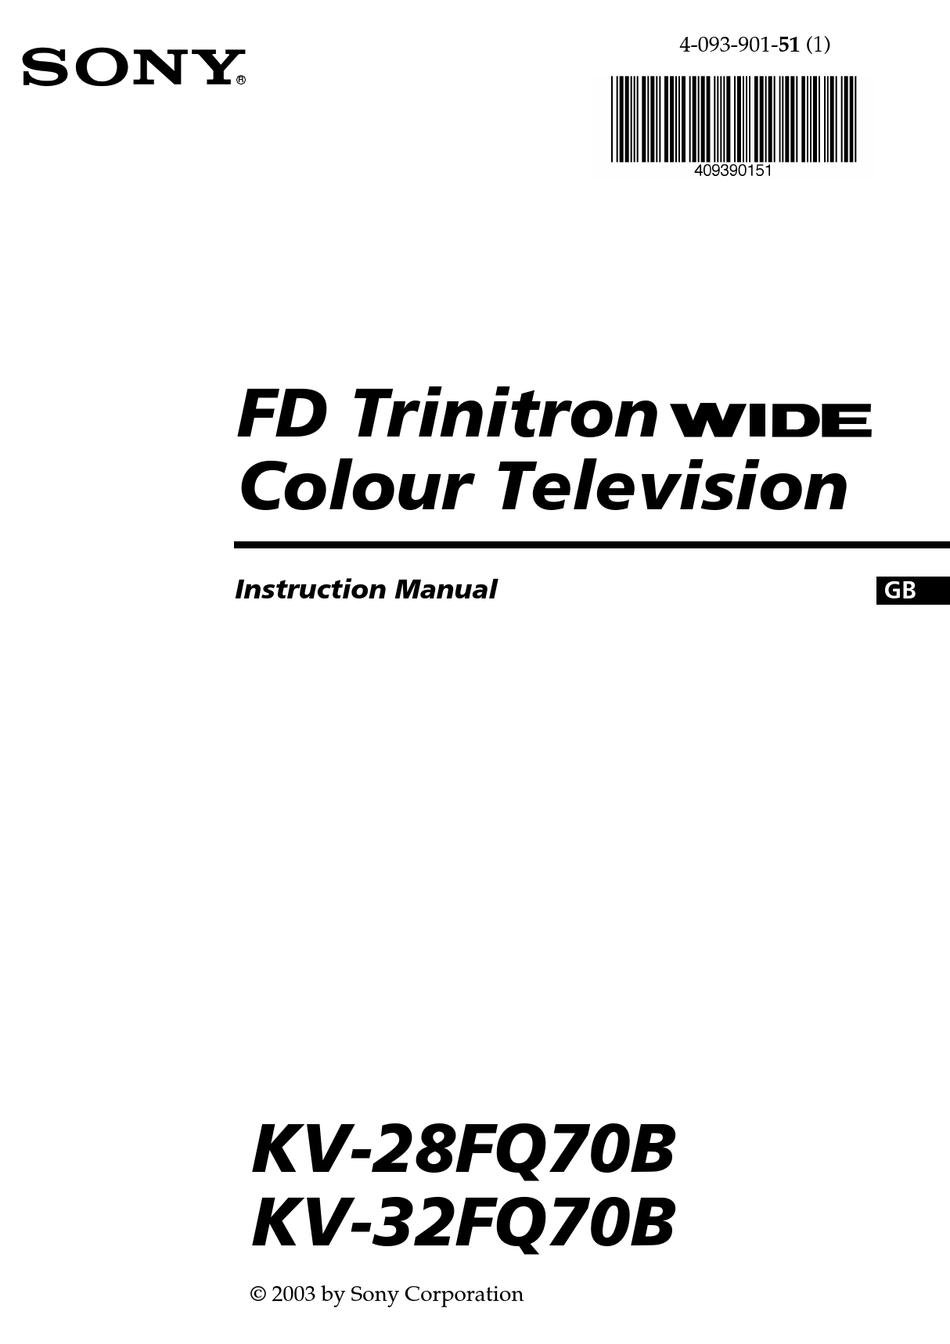 SONY FD TRINITRON KV-28FQ70B INSTRUCTION MANUAL Pdf